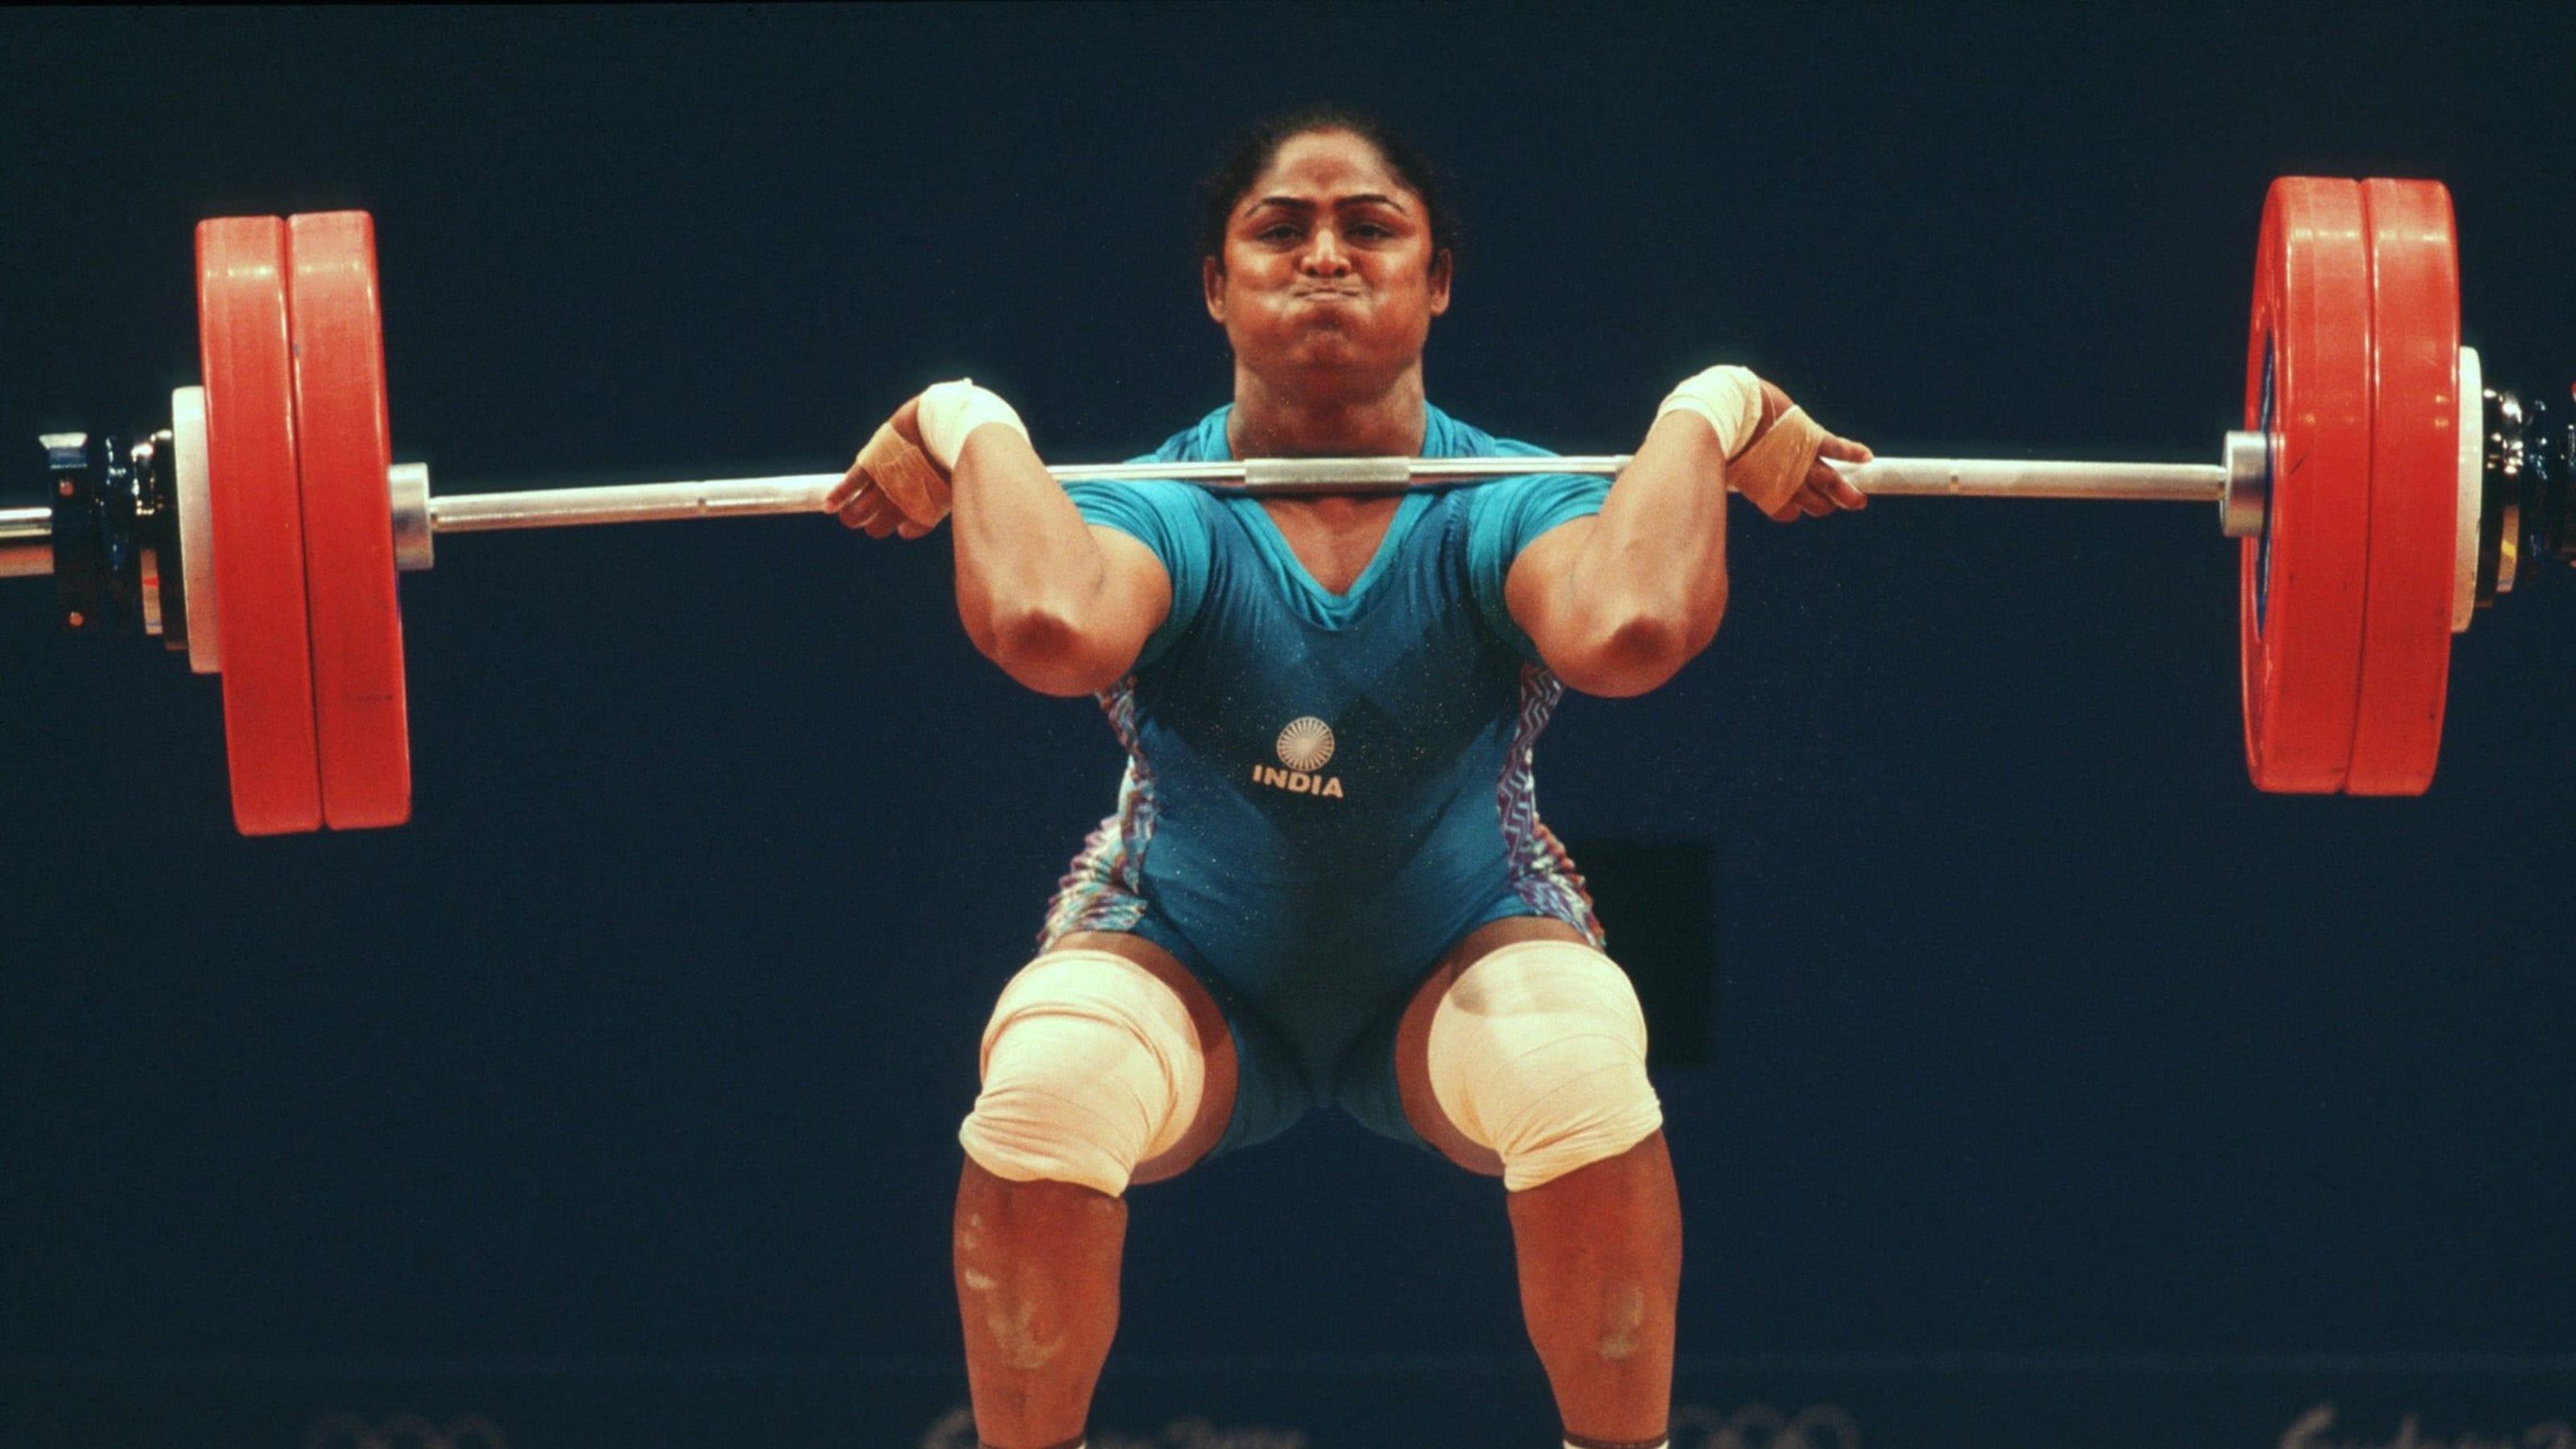 Karnam Malleswari: Achievements of India In Sports KreedOn